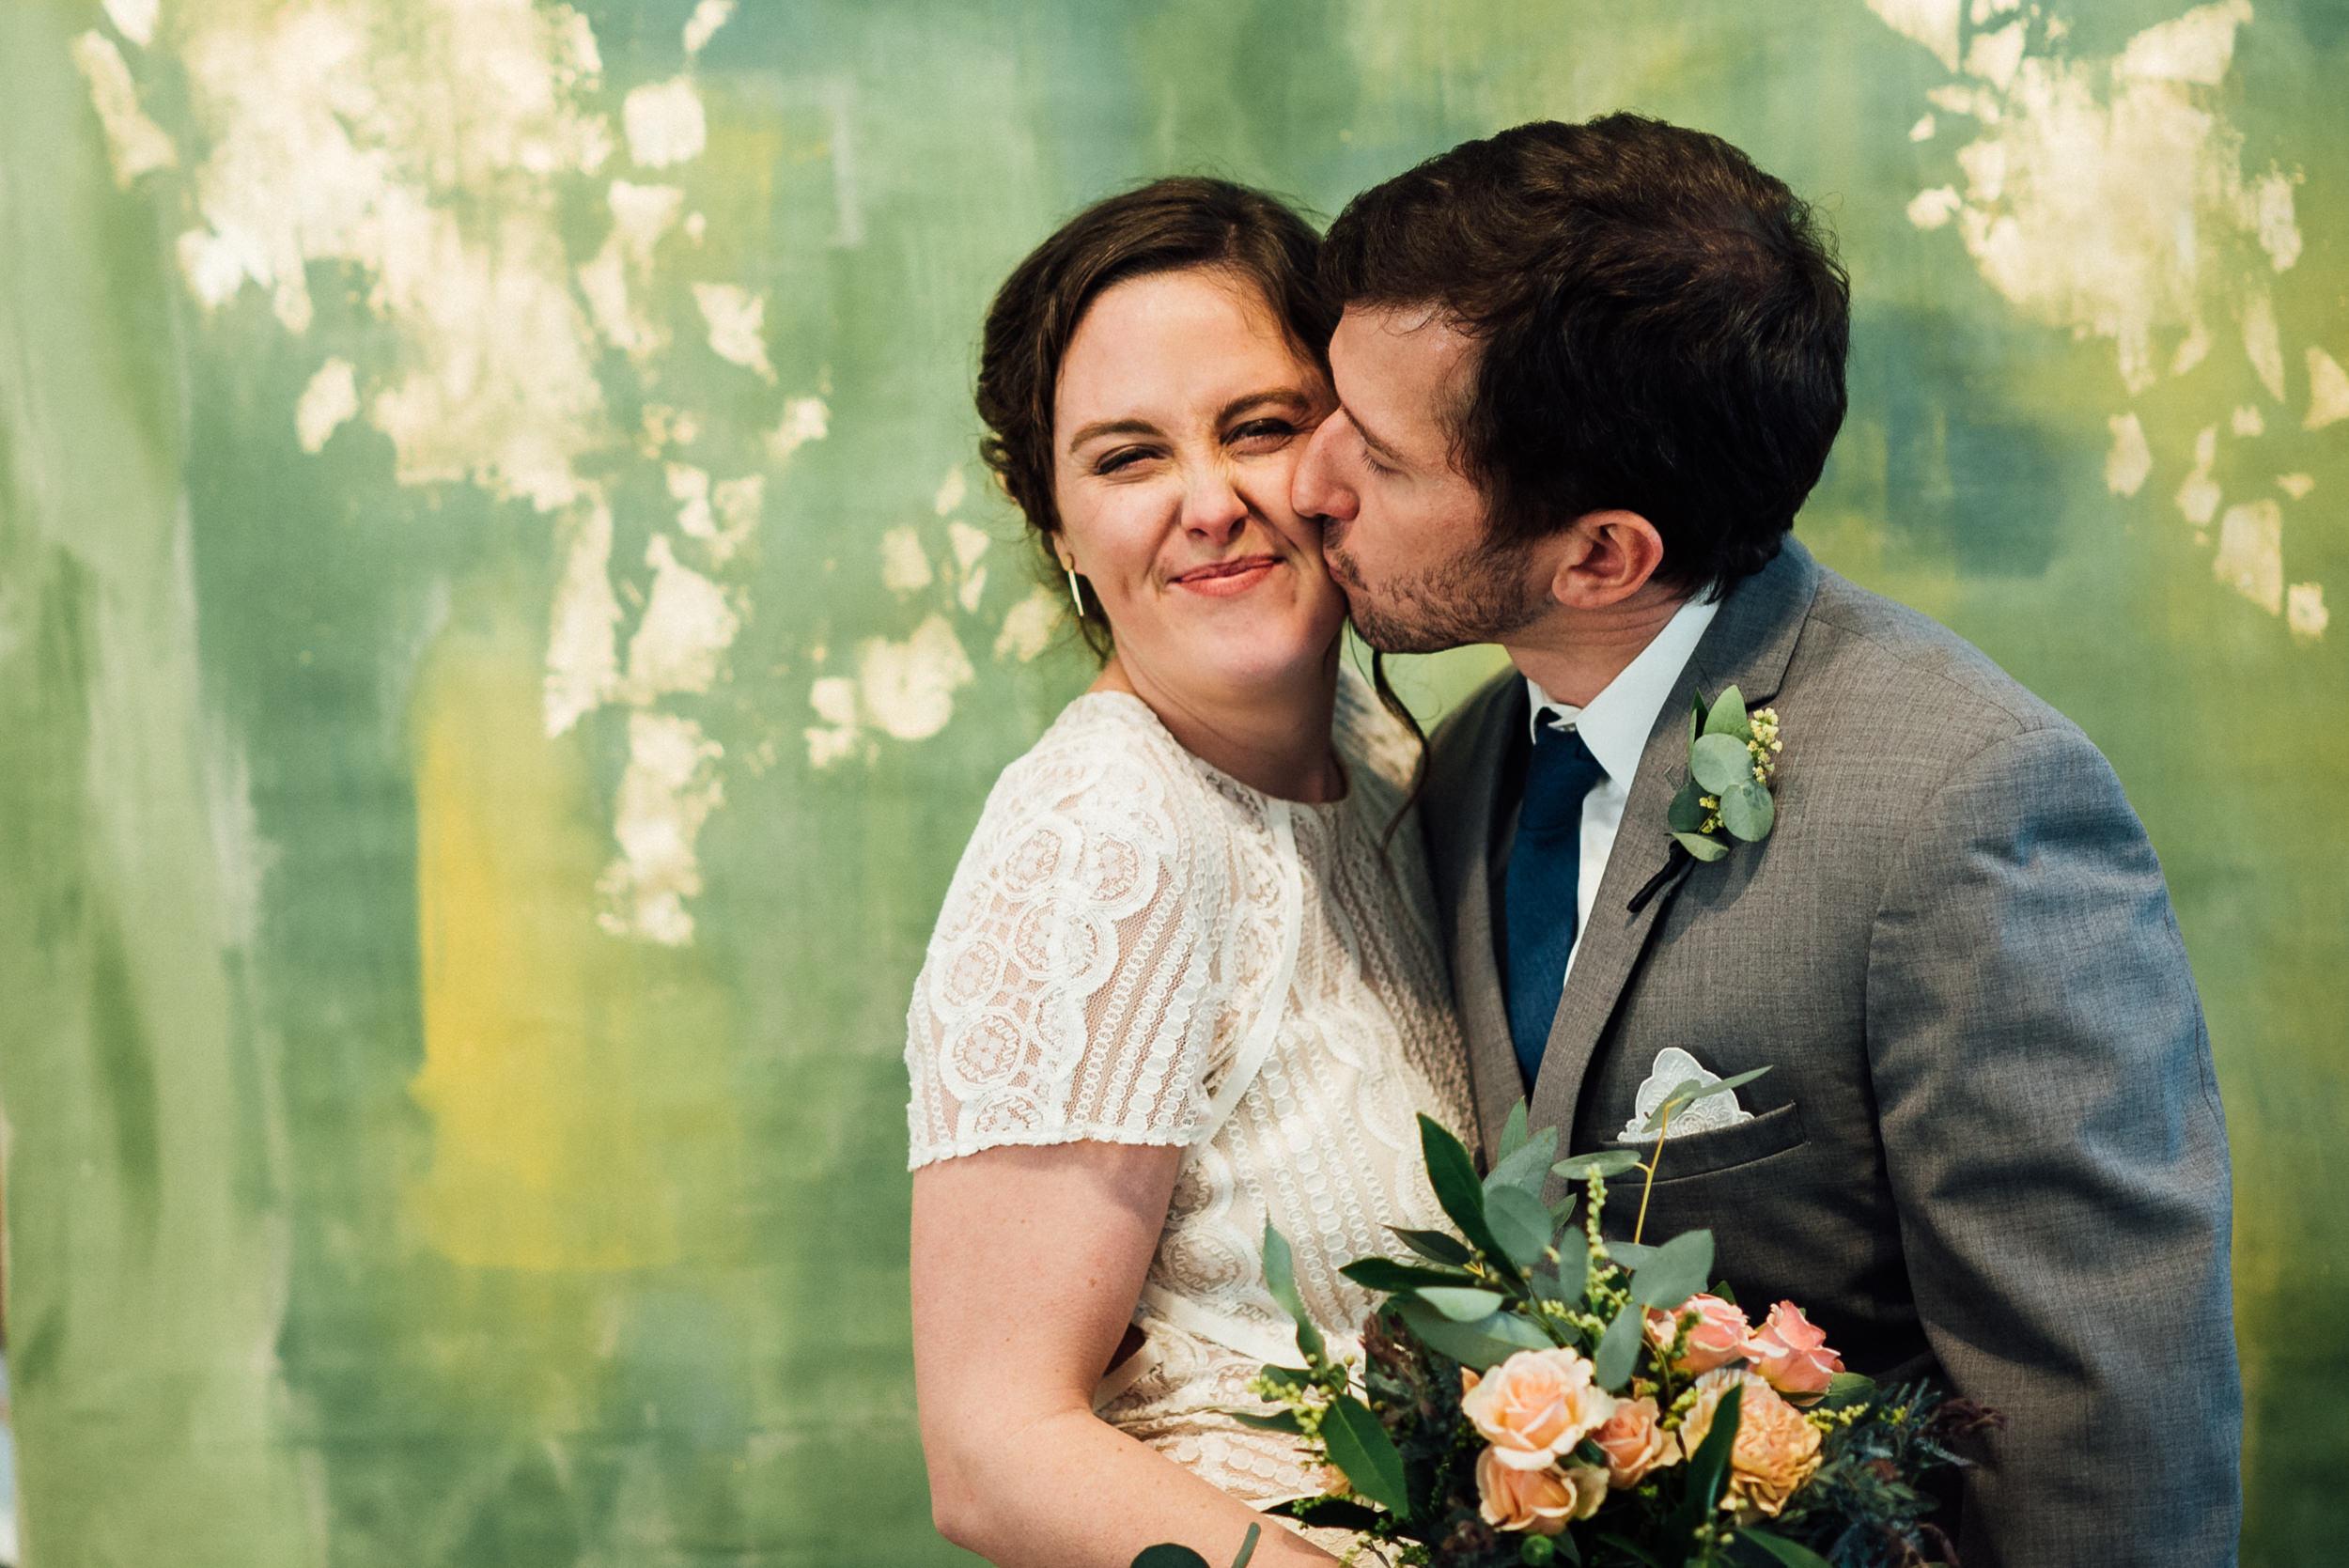 Bride and groom kissing at a Denver, Colorado Space Gallery wedding-Colorado Kate Photography